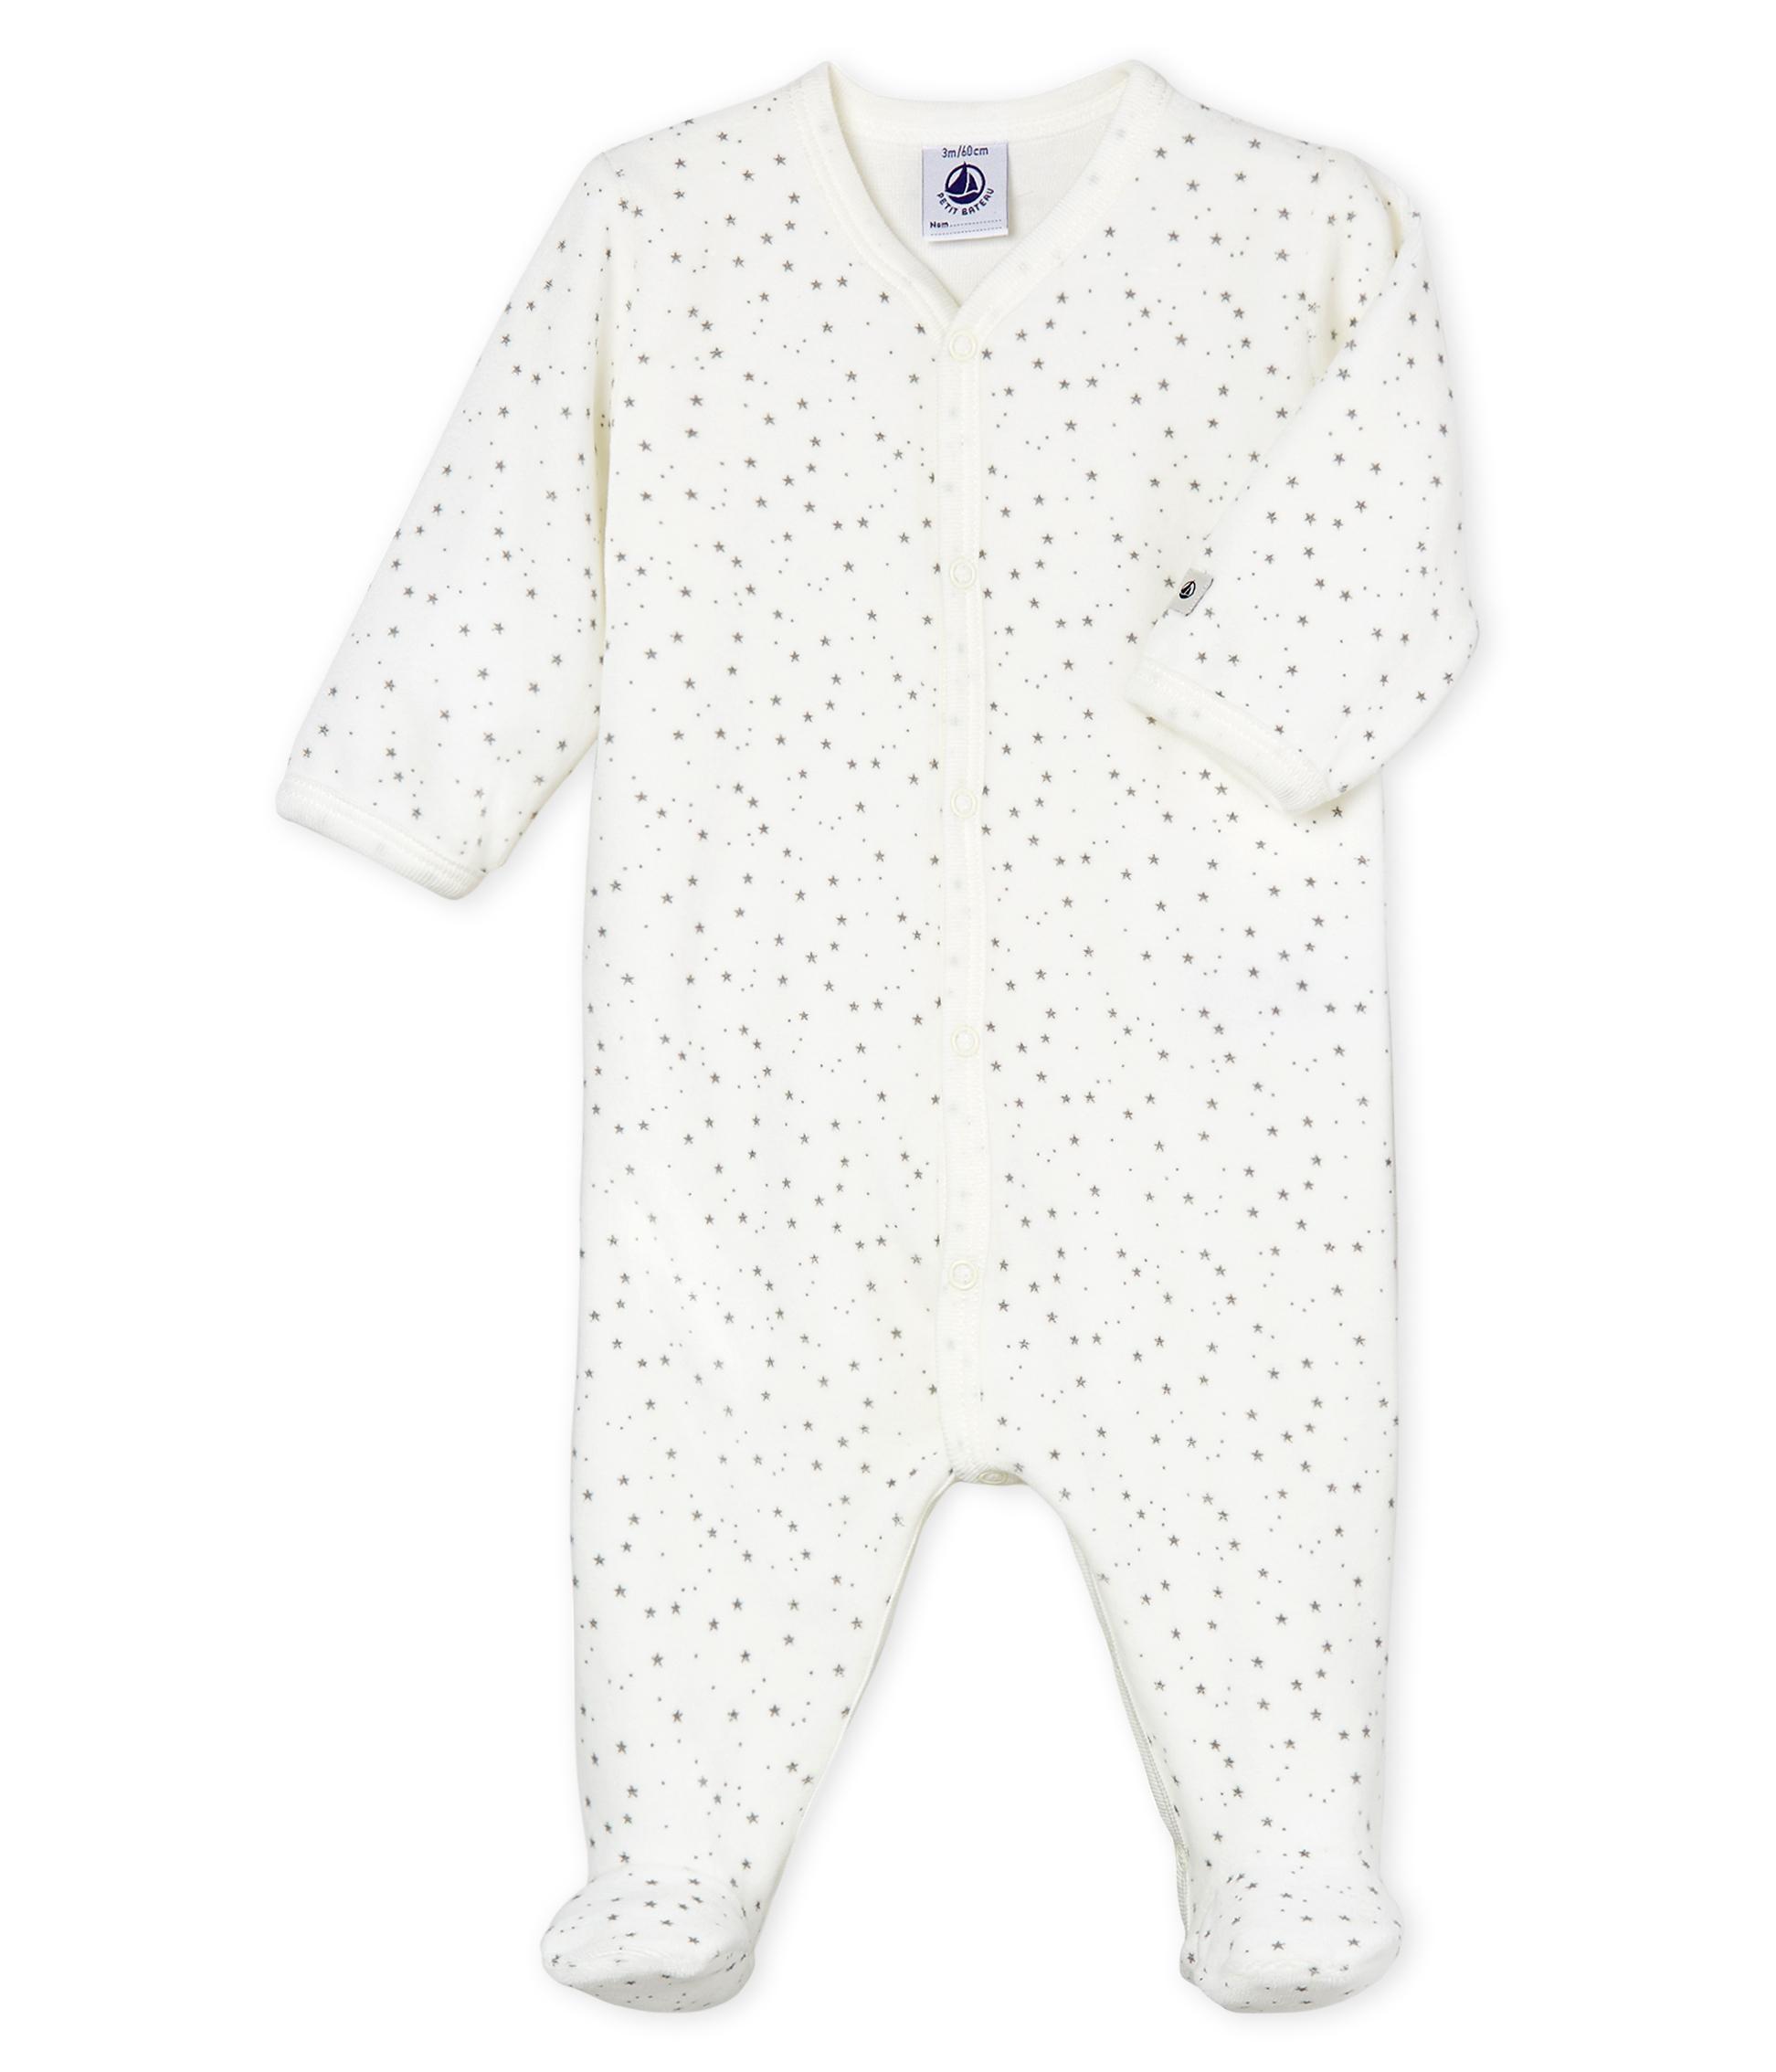 e5db973fc Babies' Unisex Velour Sleepsuit